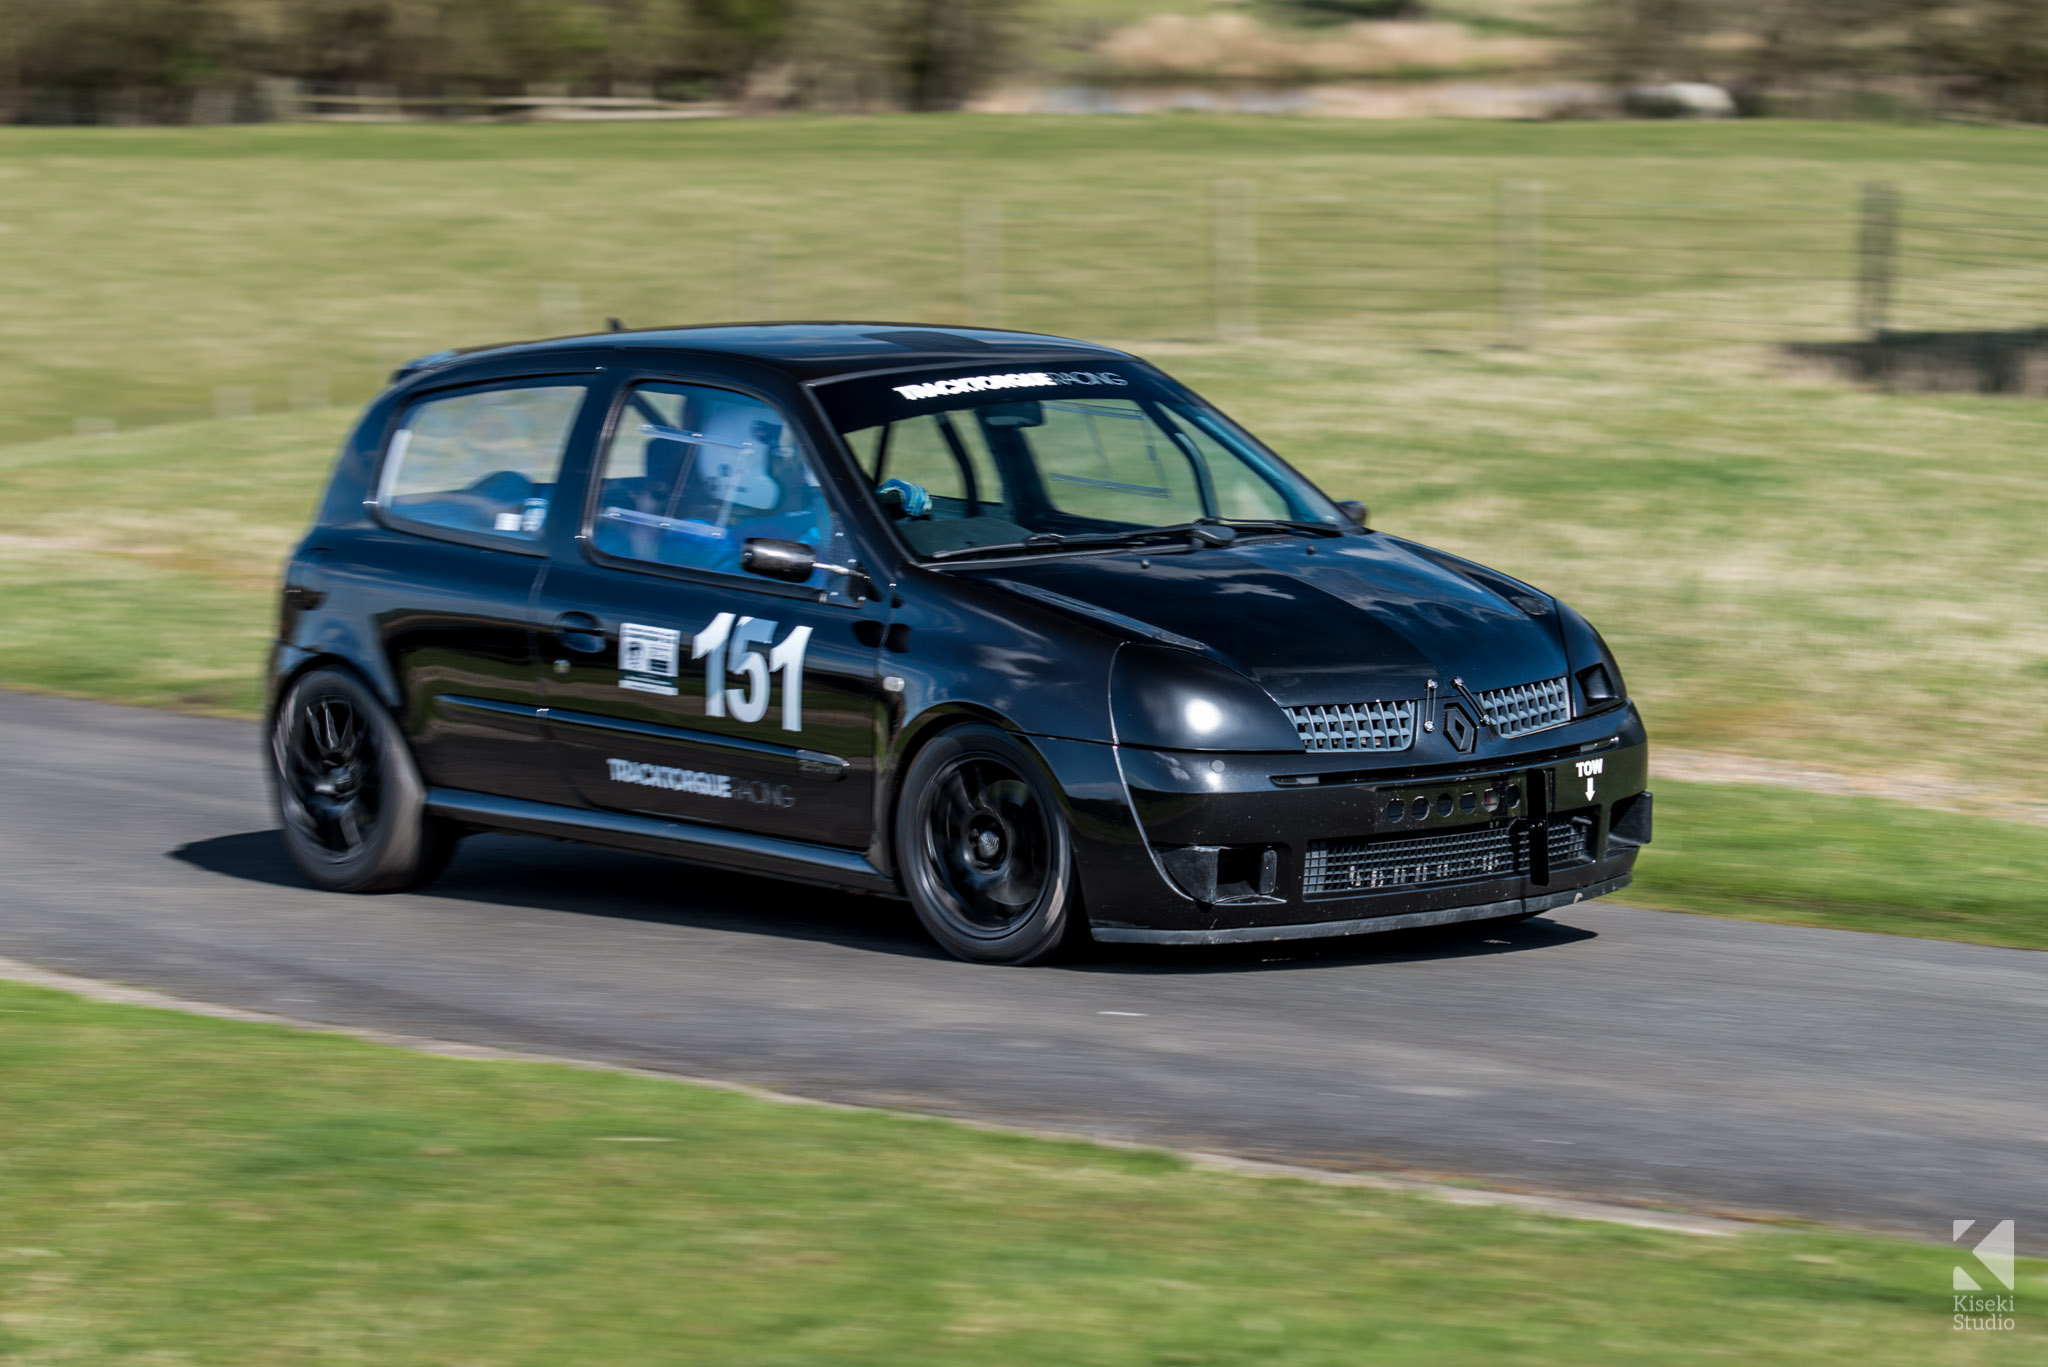 Renault Clio Sport Black Racing at Harewood